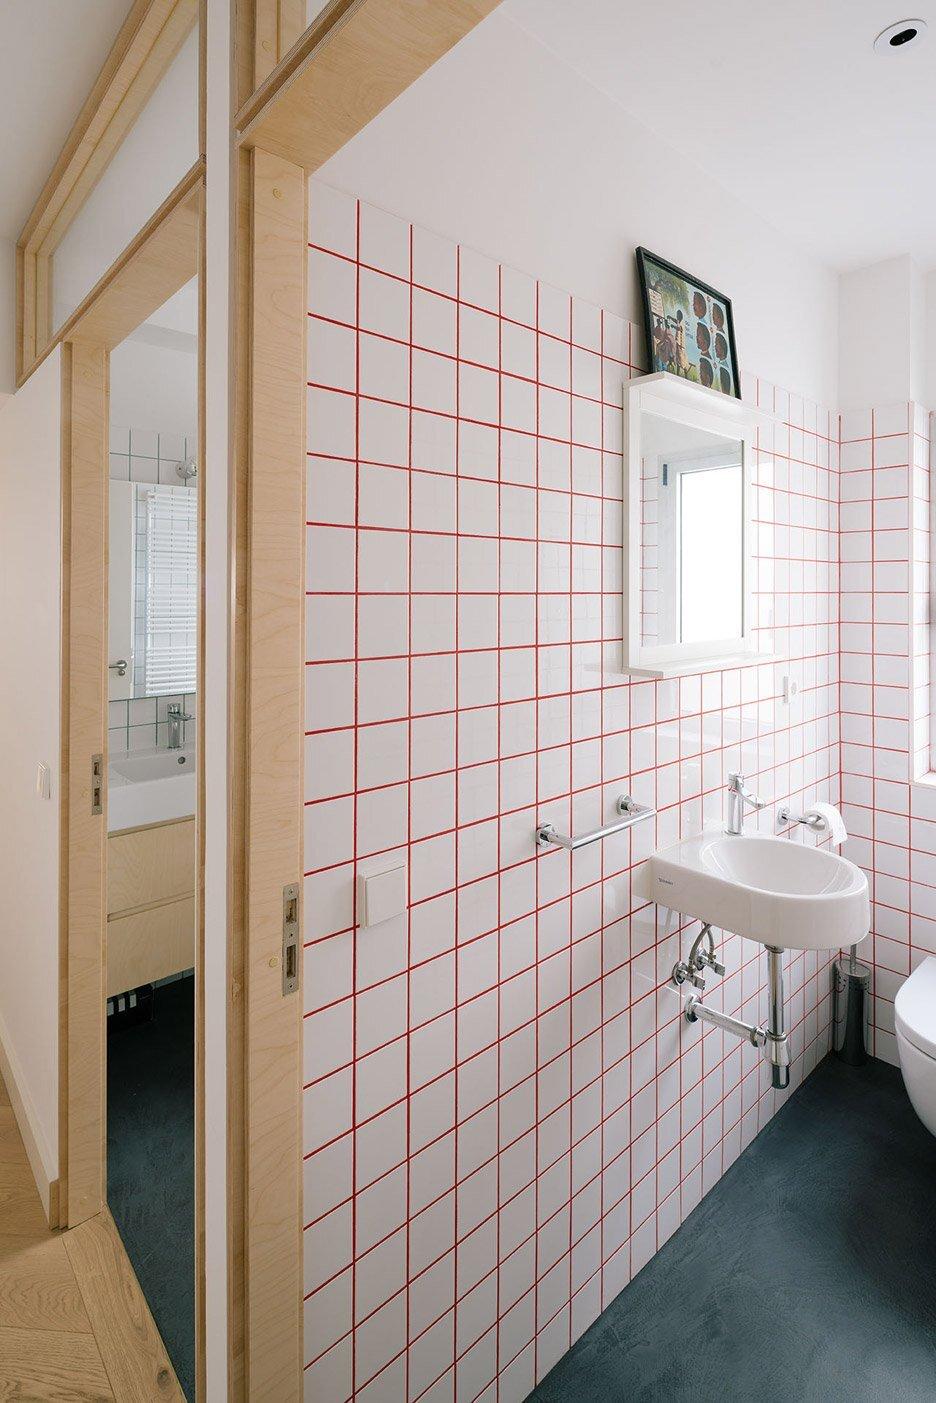 Casa MD - Small Apartment - PYO Arquitectos - Madrid - Bathroom - Humble Homes